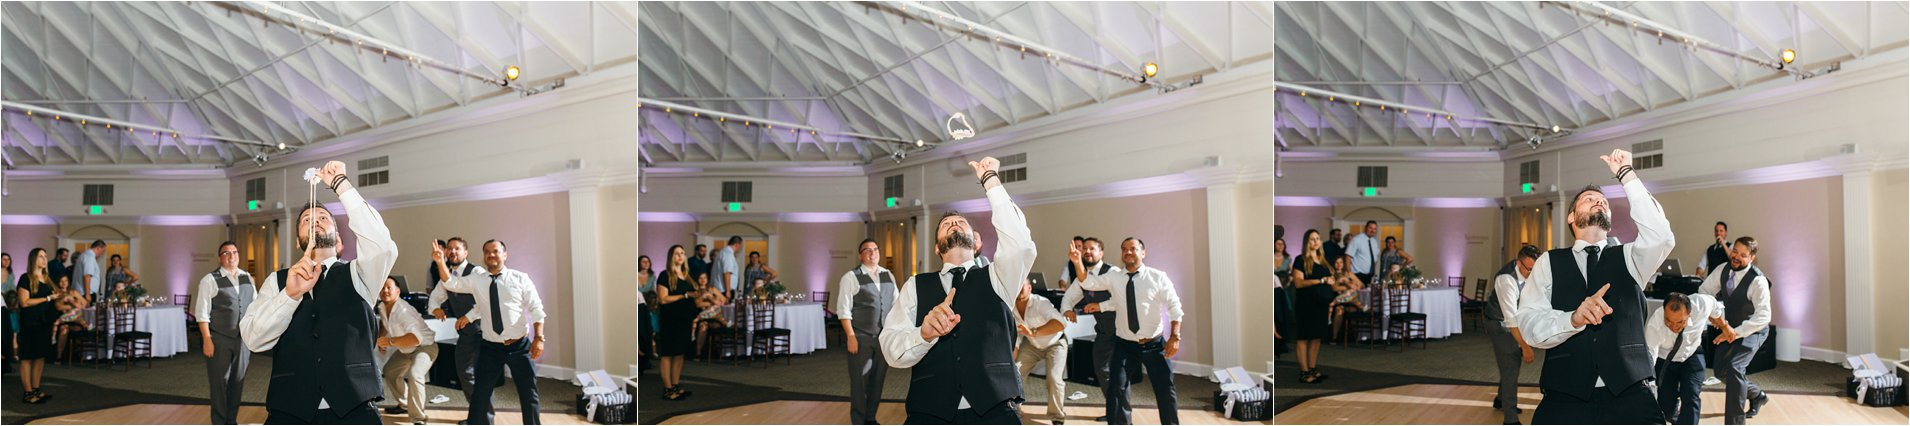 Orange County Wedding - Garter Toss